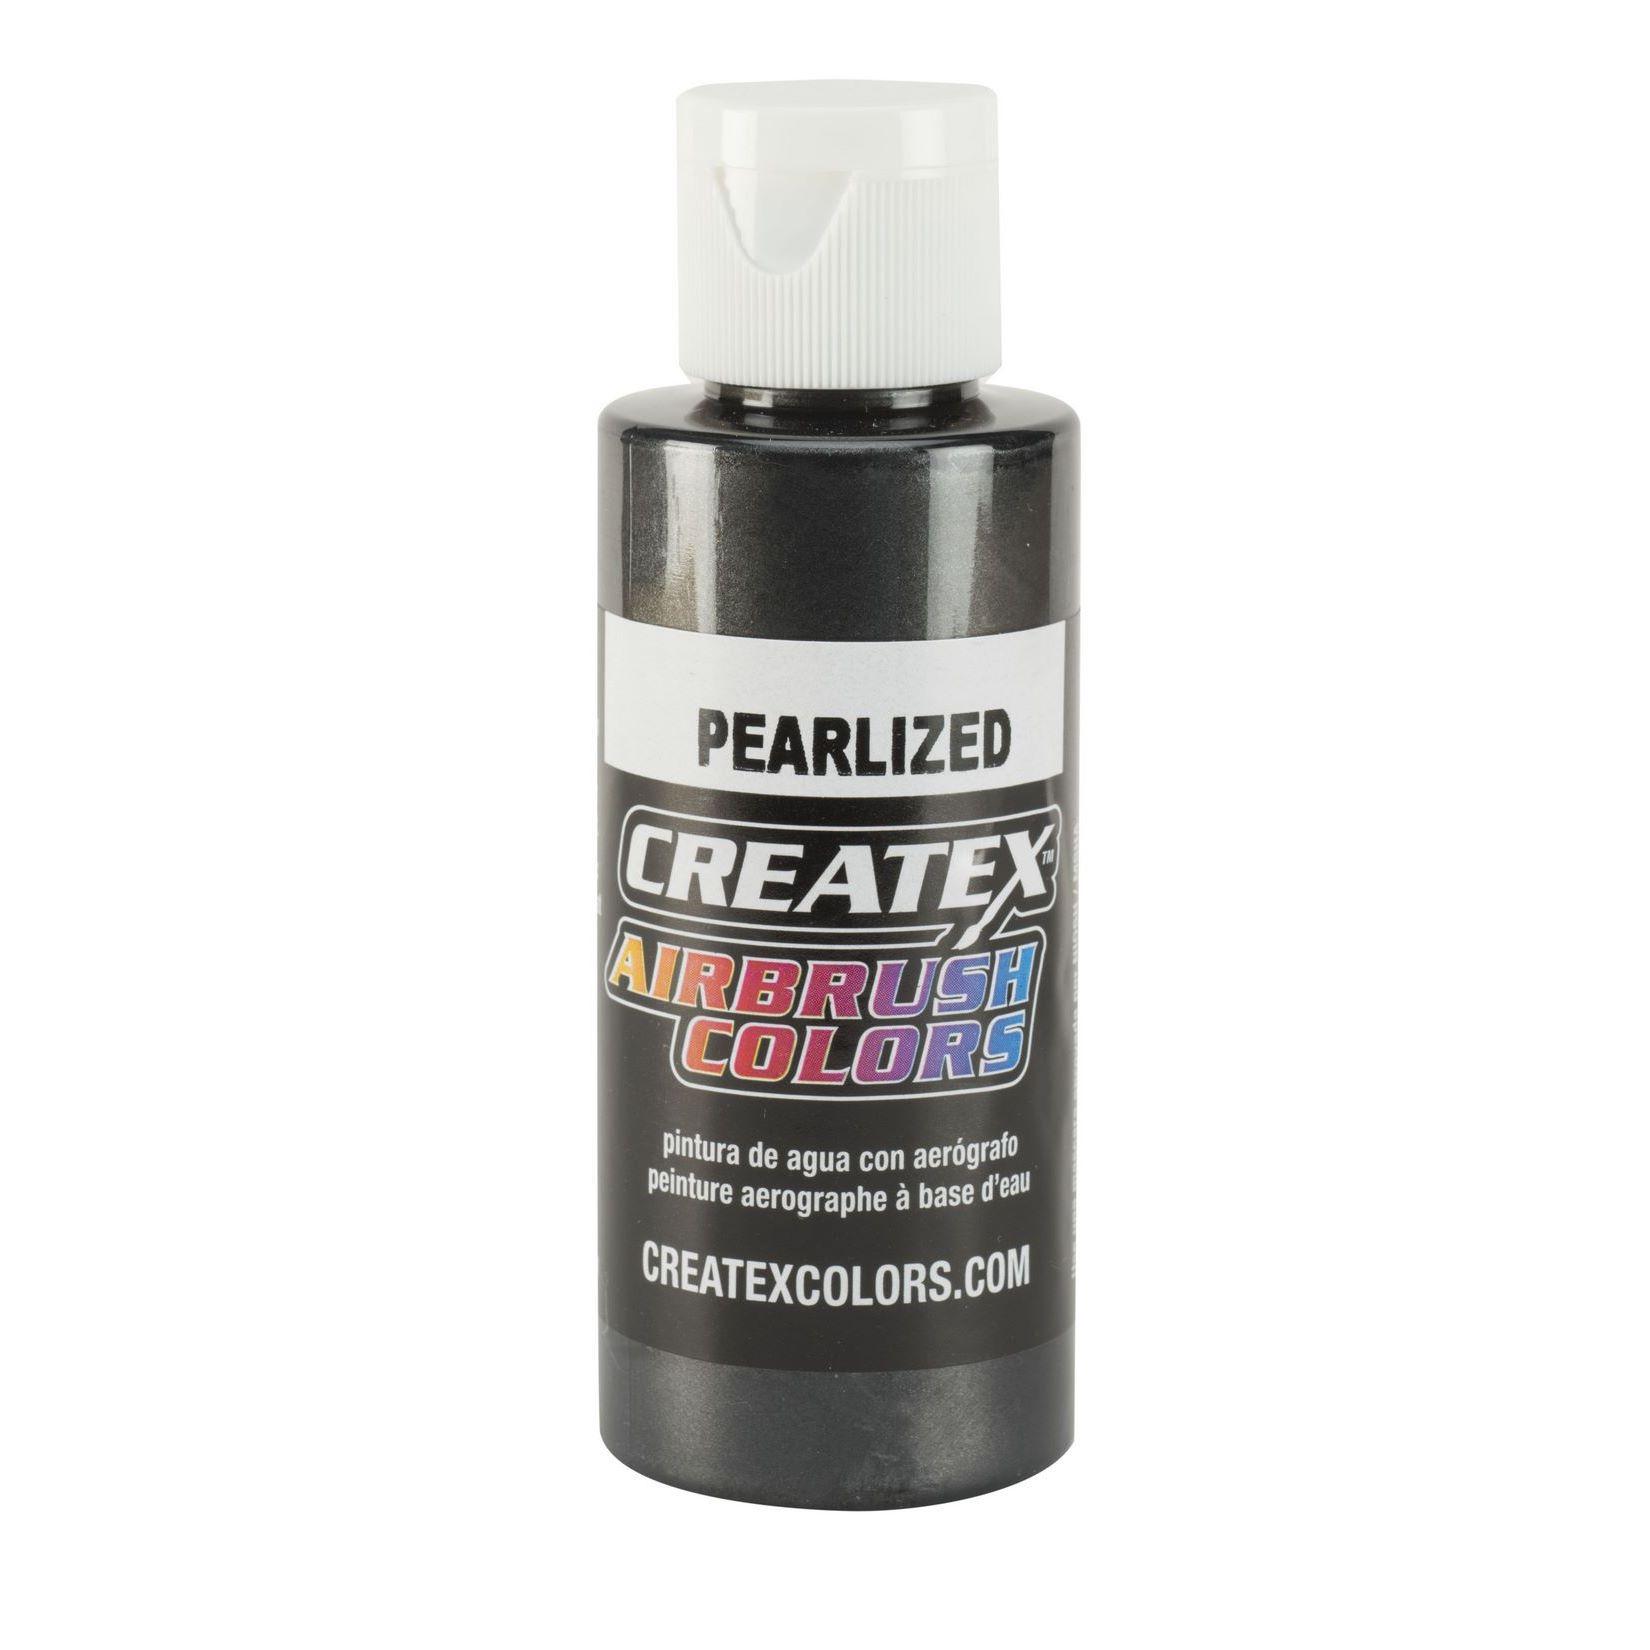 pearl Schwarz Createx Airbrush Colors Farbe 60ml 11 5315 Createx